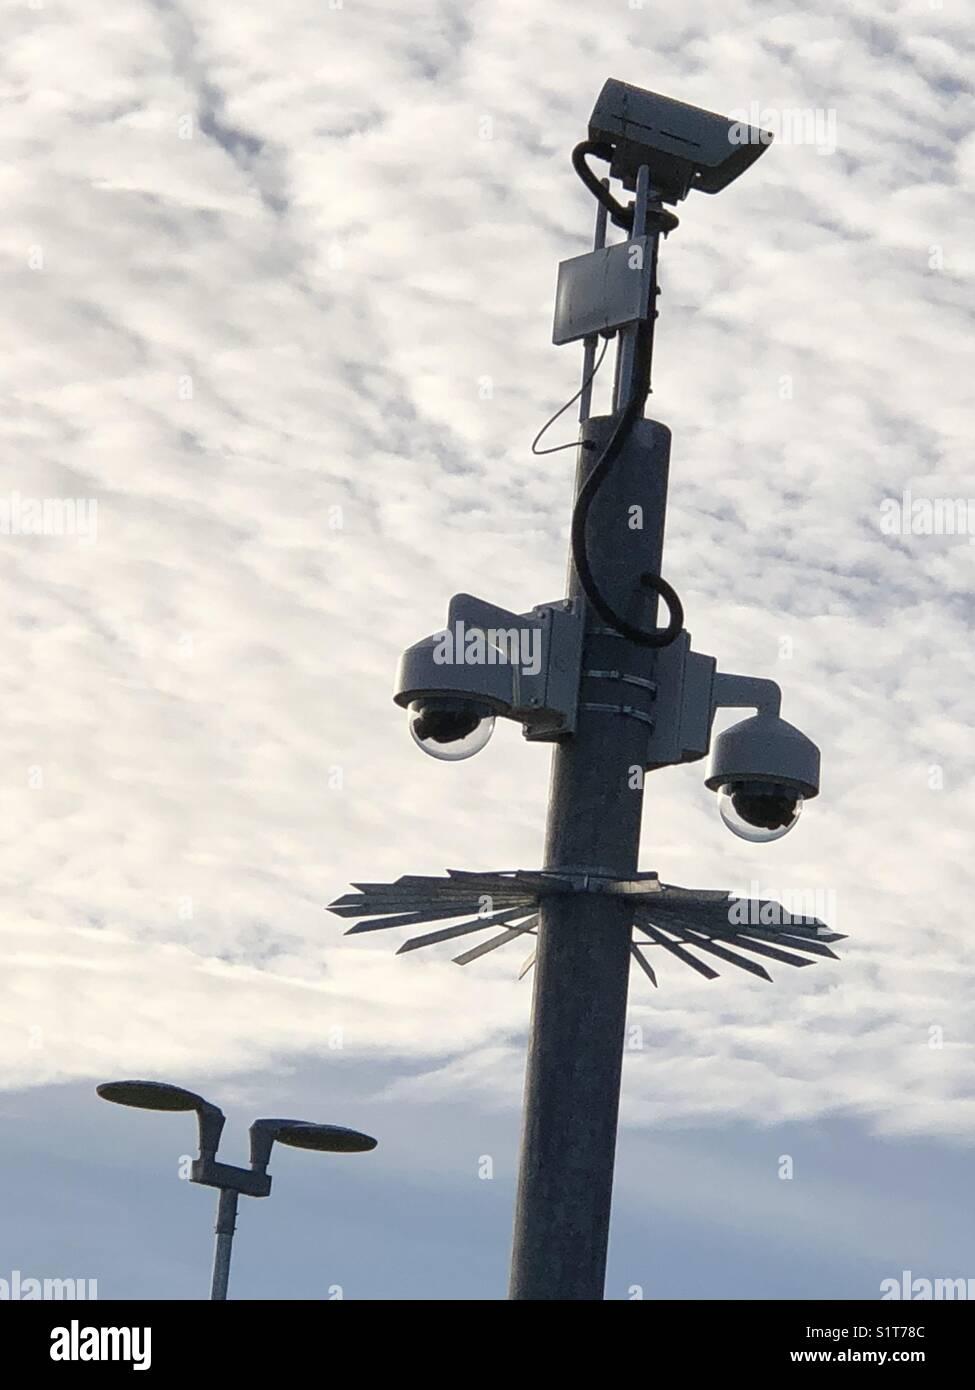 CCTV camera at Willen lakeside car park, Milton Keynes , England - Stock Image